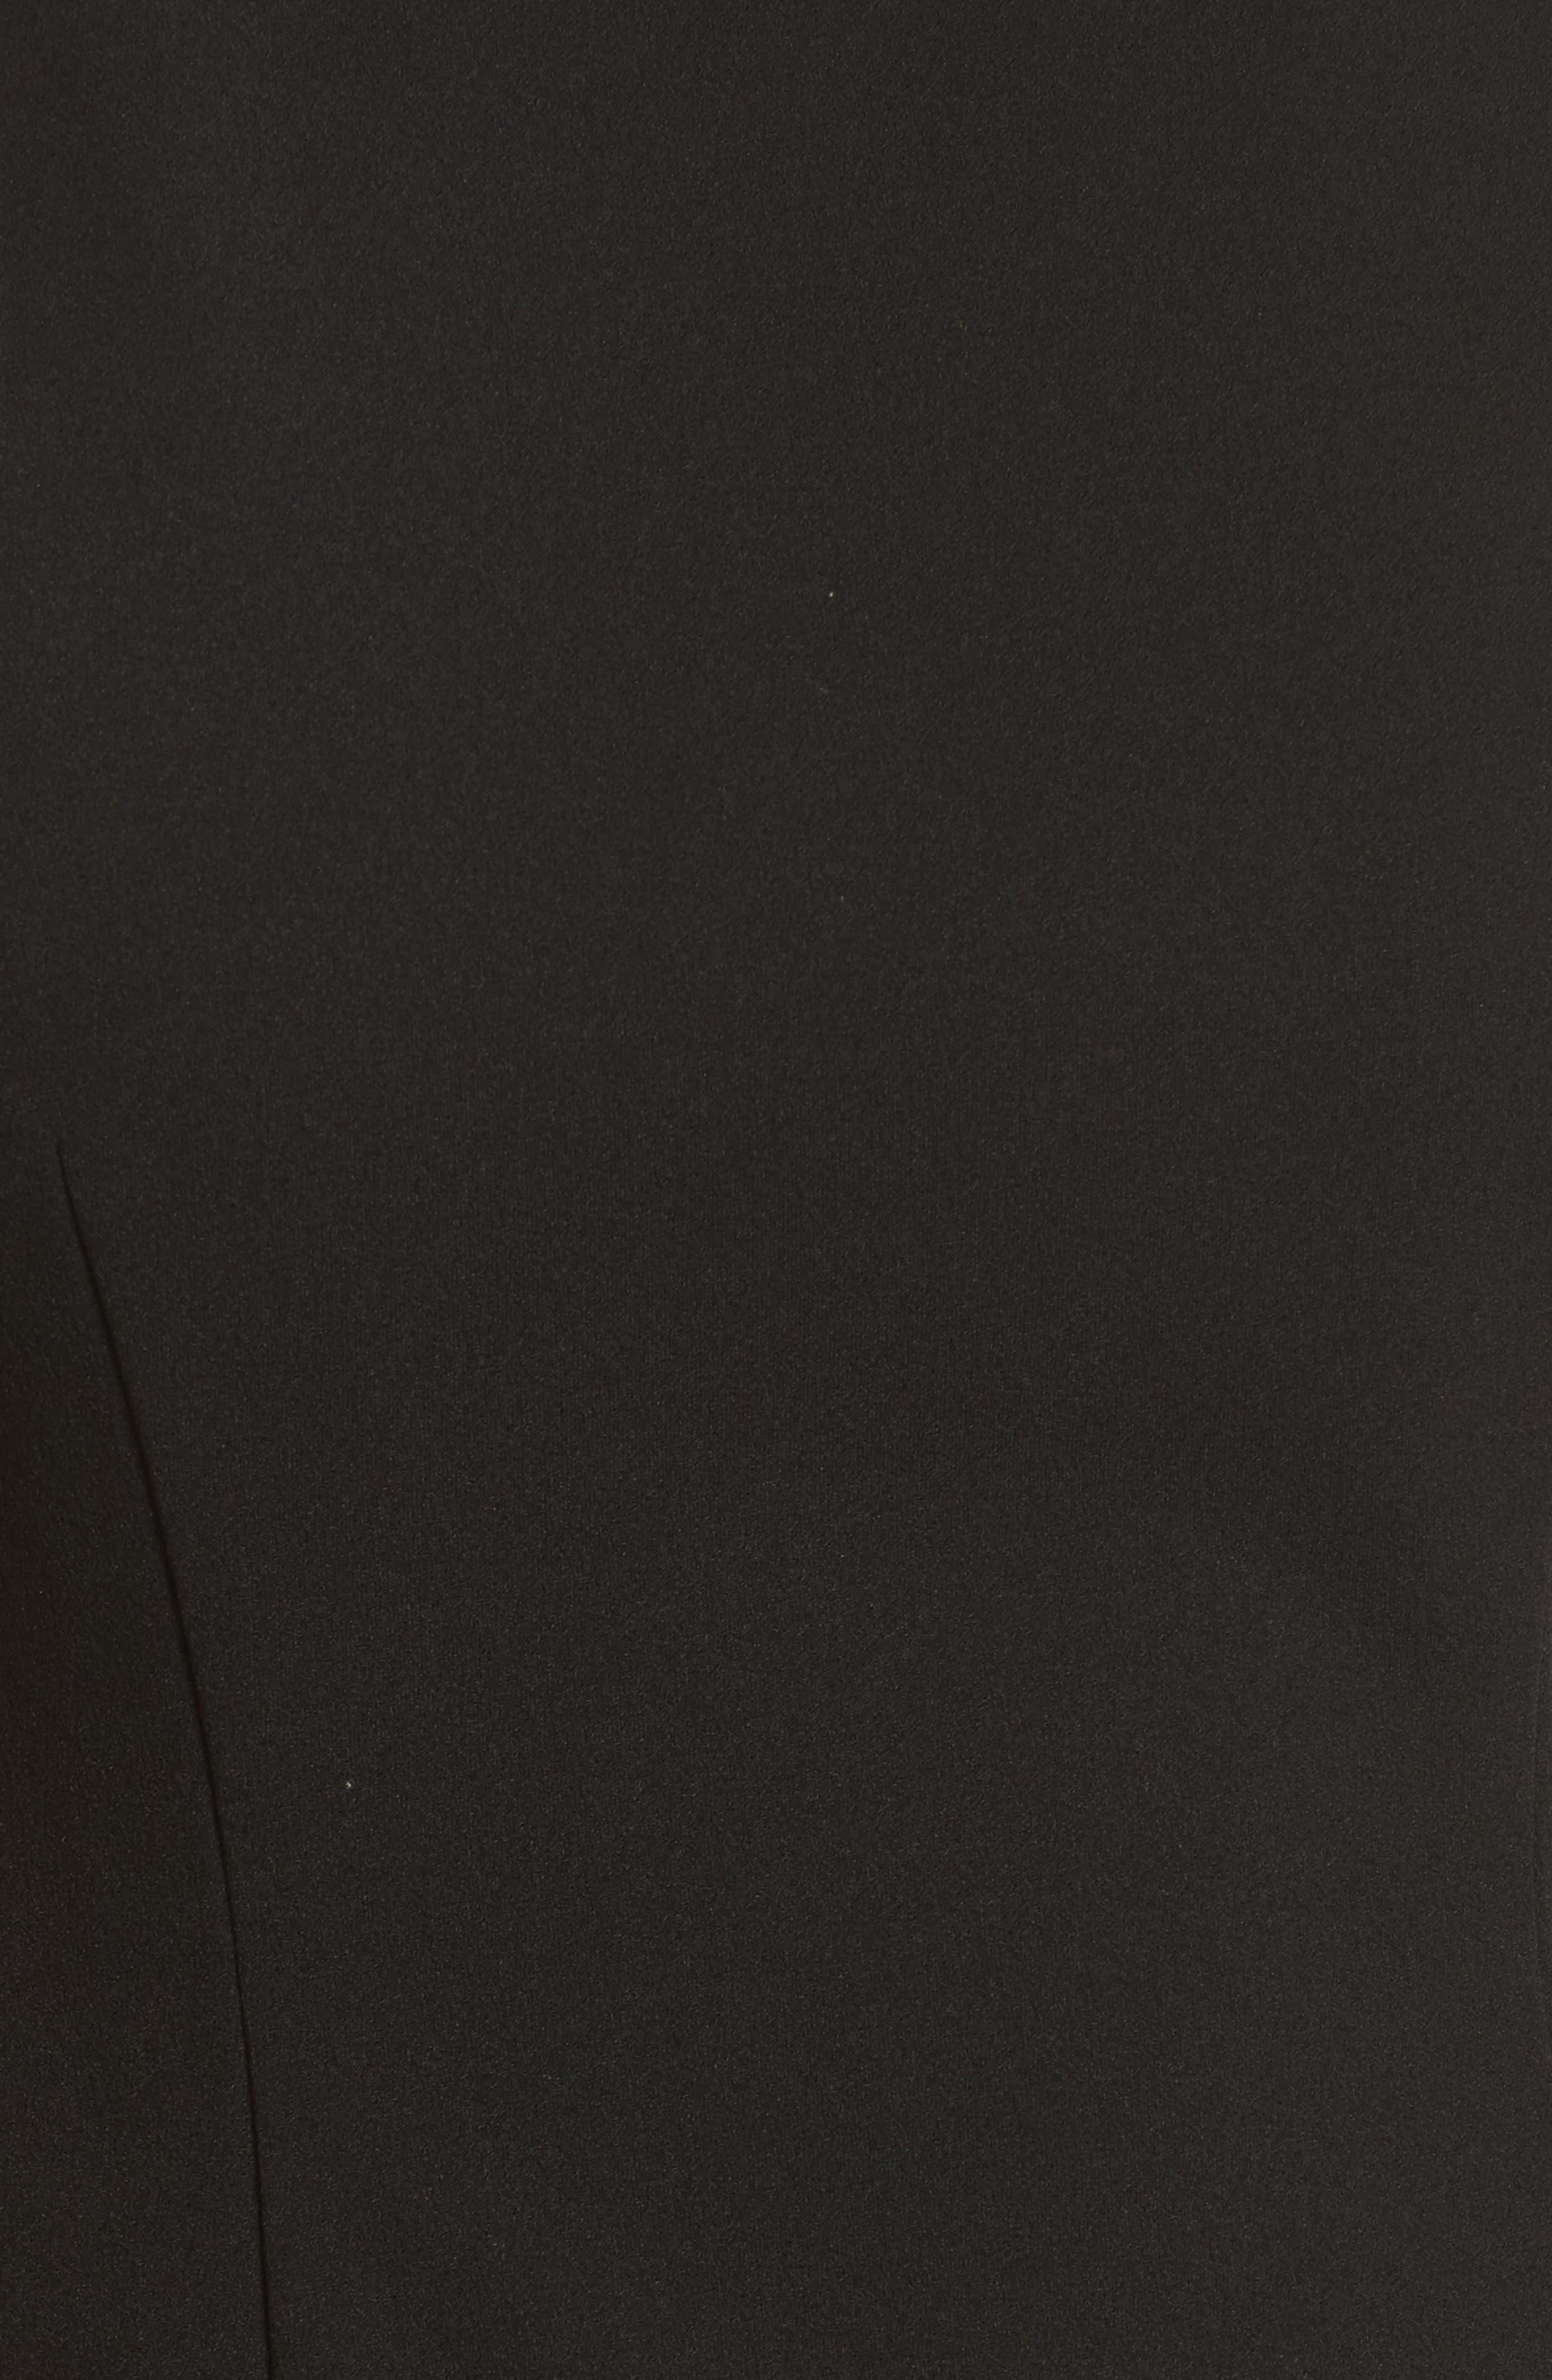 Bead Embellished Crepe Shift Dress,                             Alternate thumbnail 5, color,                             Black